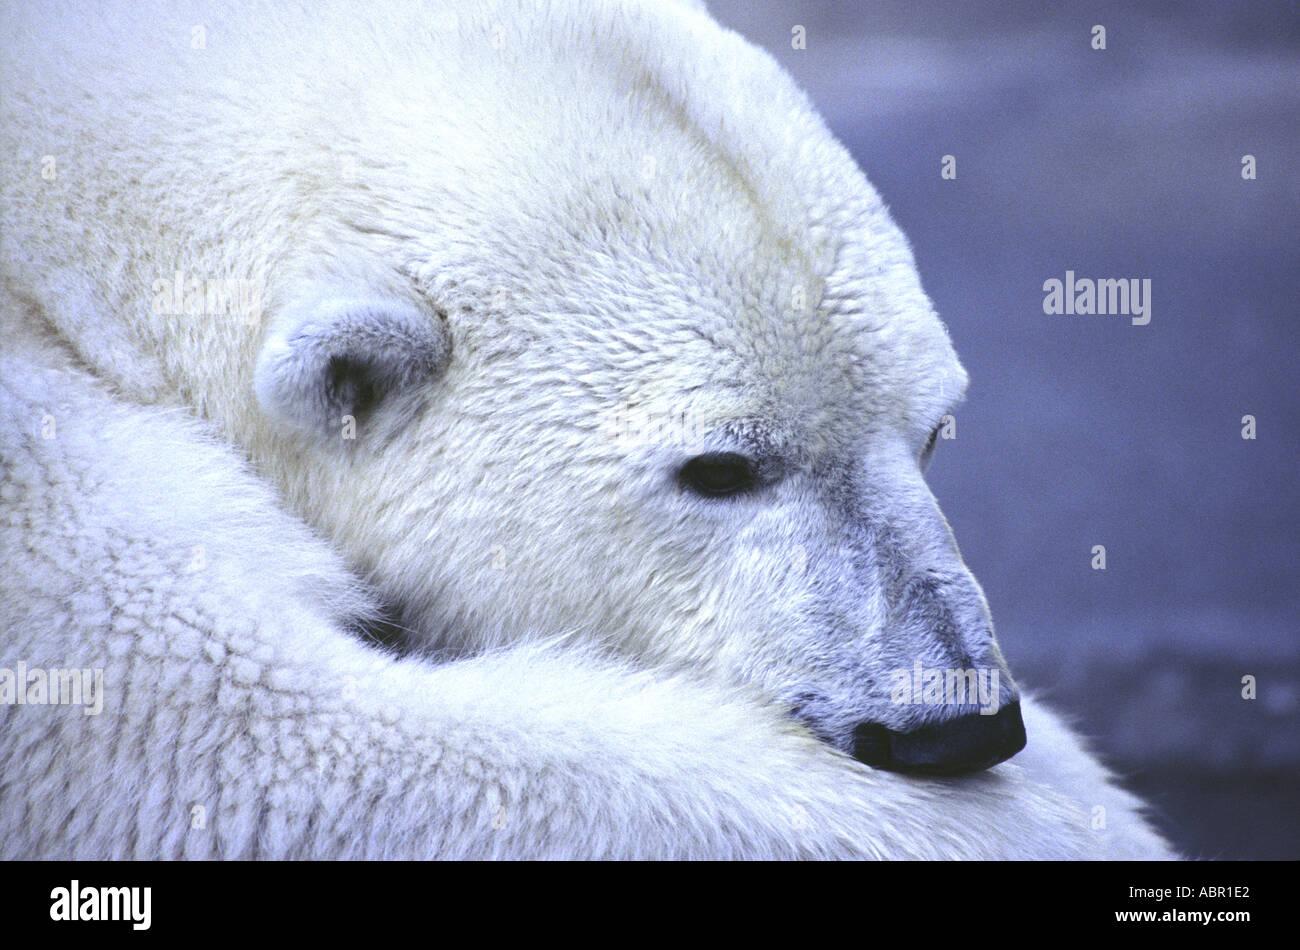 Napping Polar Bear - Stock Image